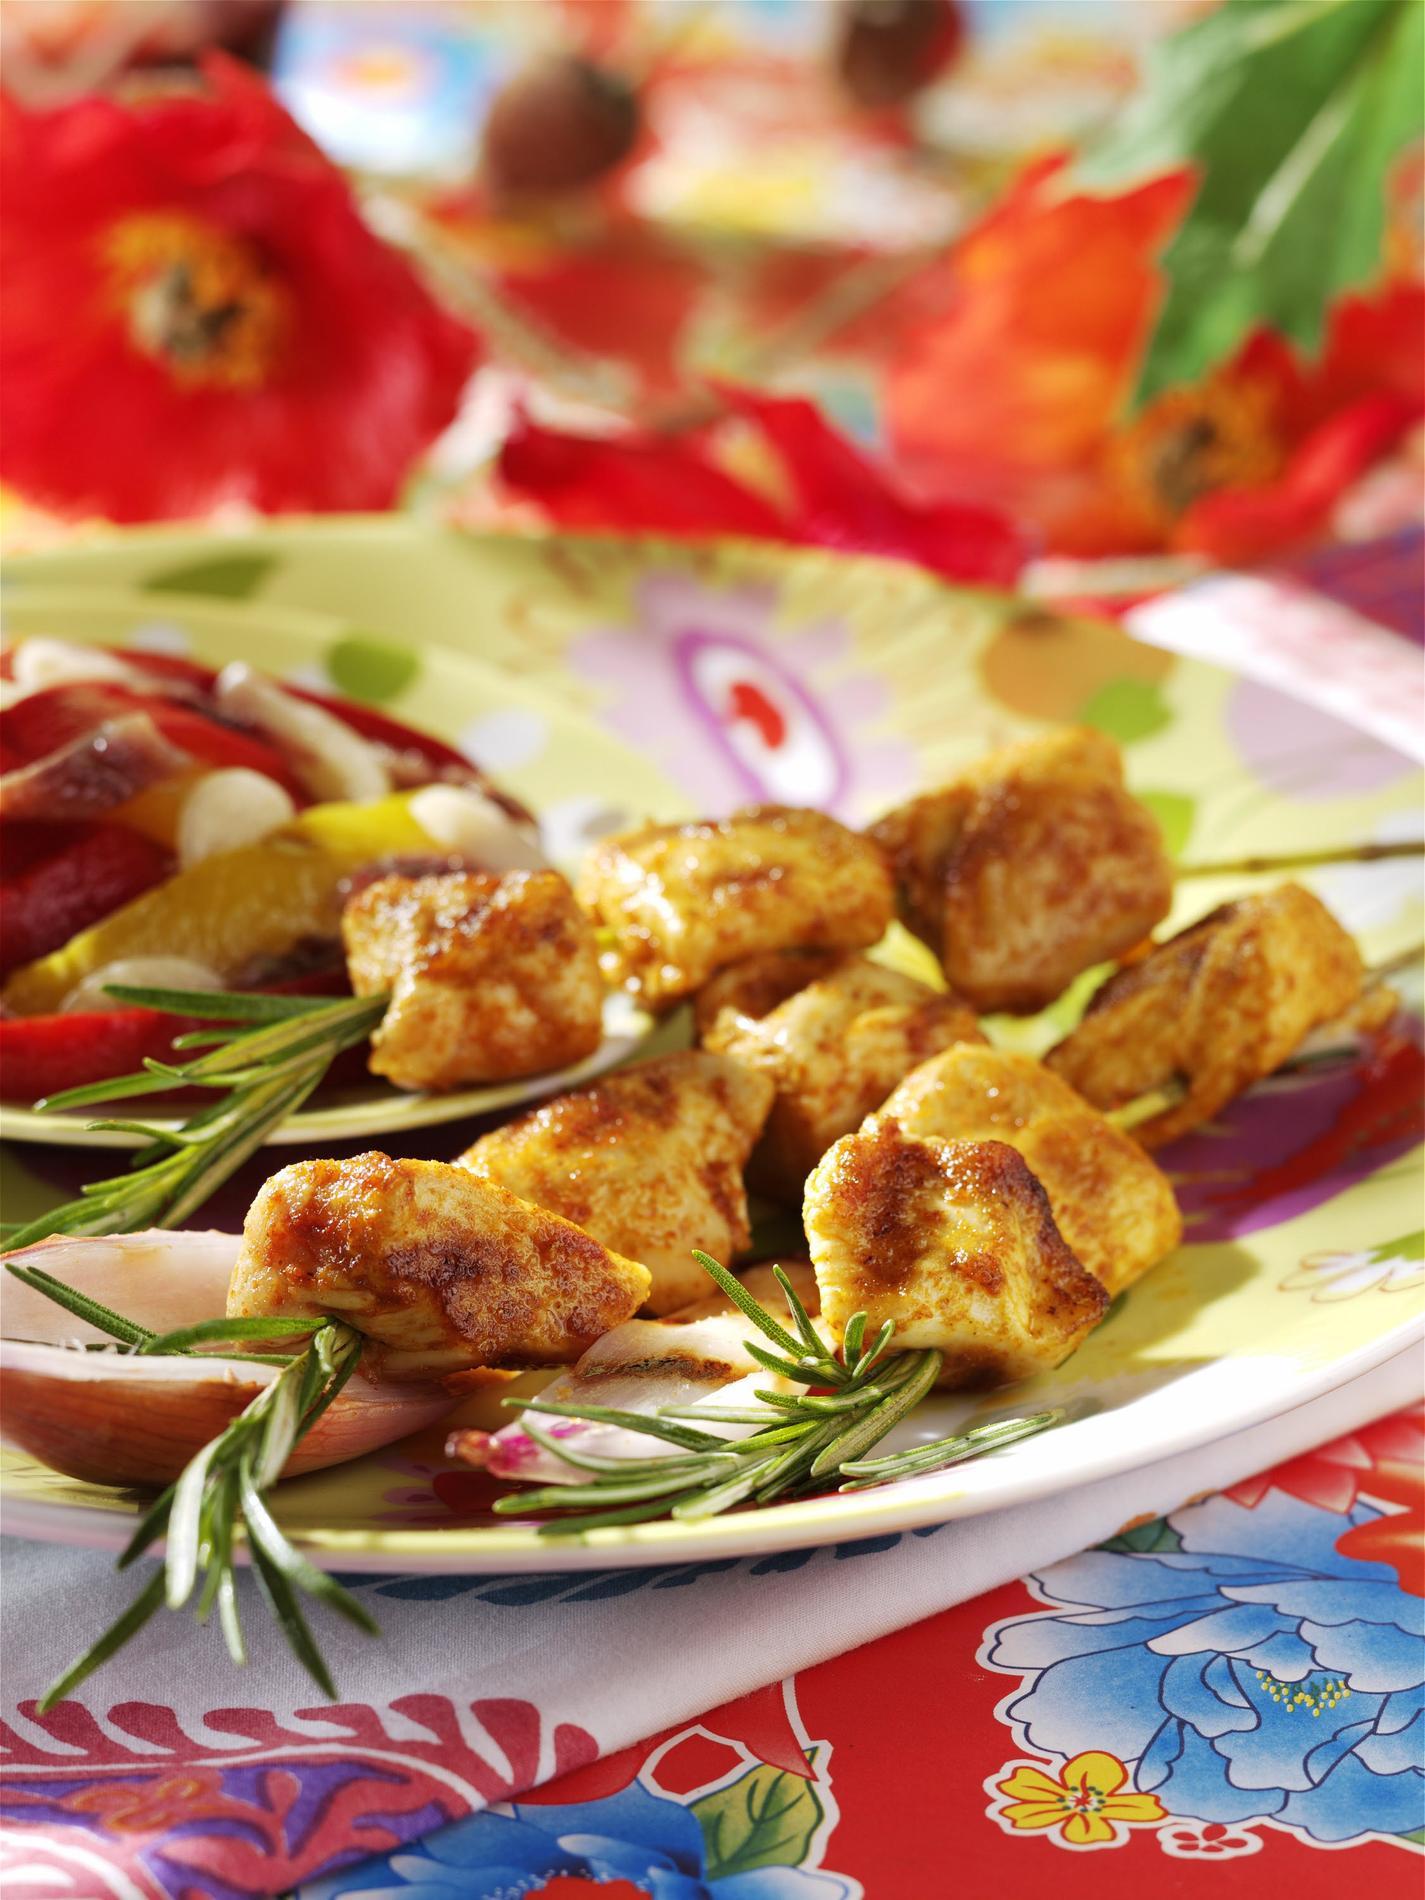 recette brochettes de poulet marin au paprika cuisine madame figaro. Black Bedroom Furniture Sets. Home Design Ideas